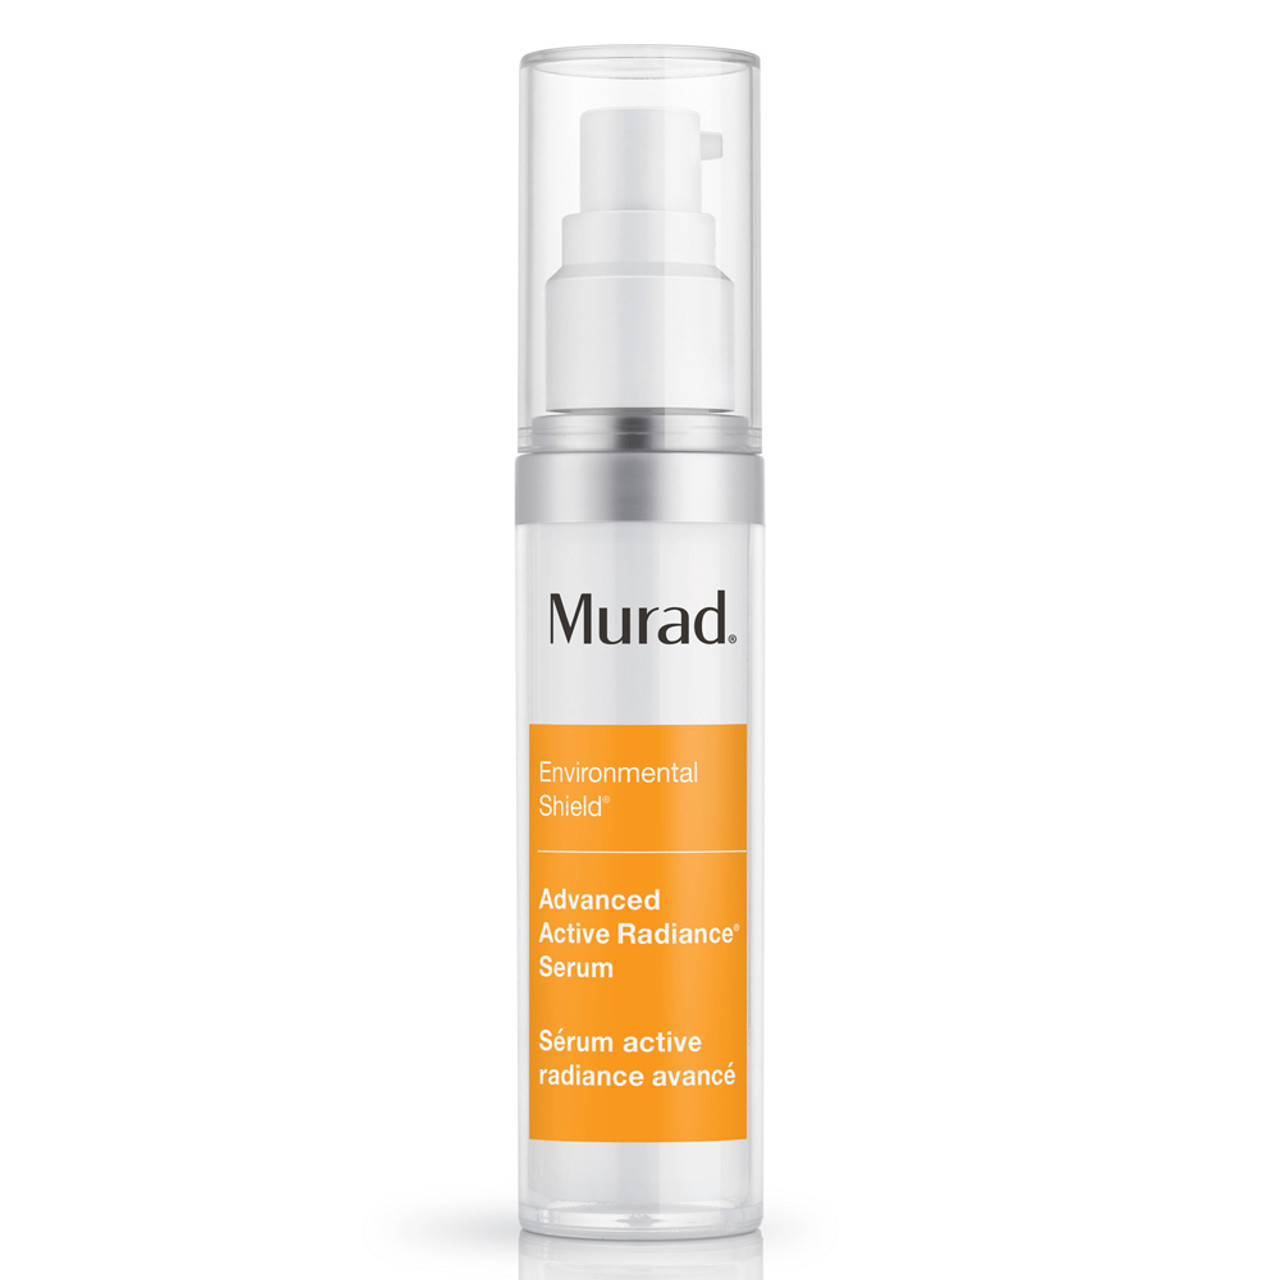 Murad Environmental Shield™ Advanced Active Radiance Serum